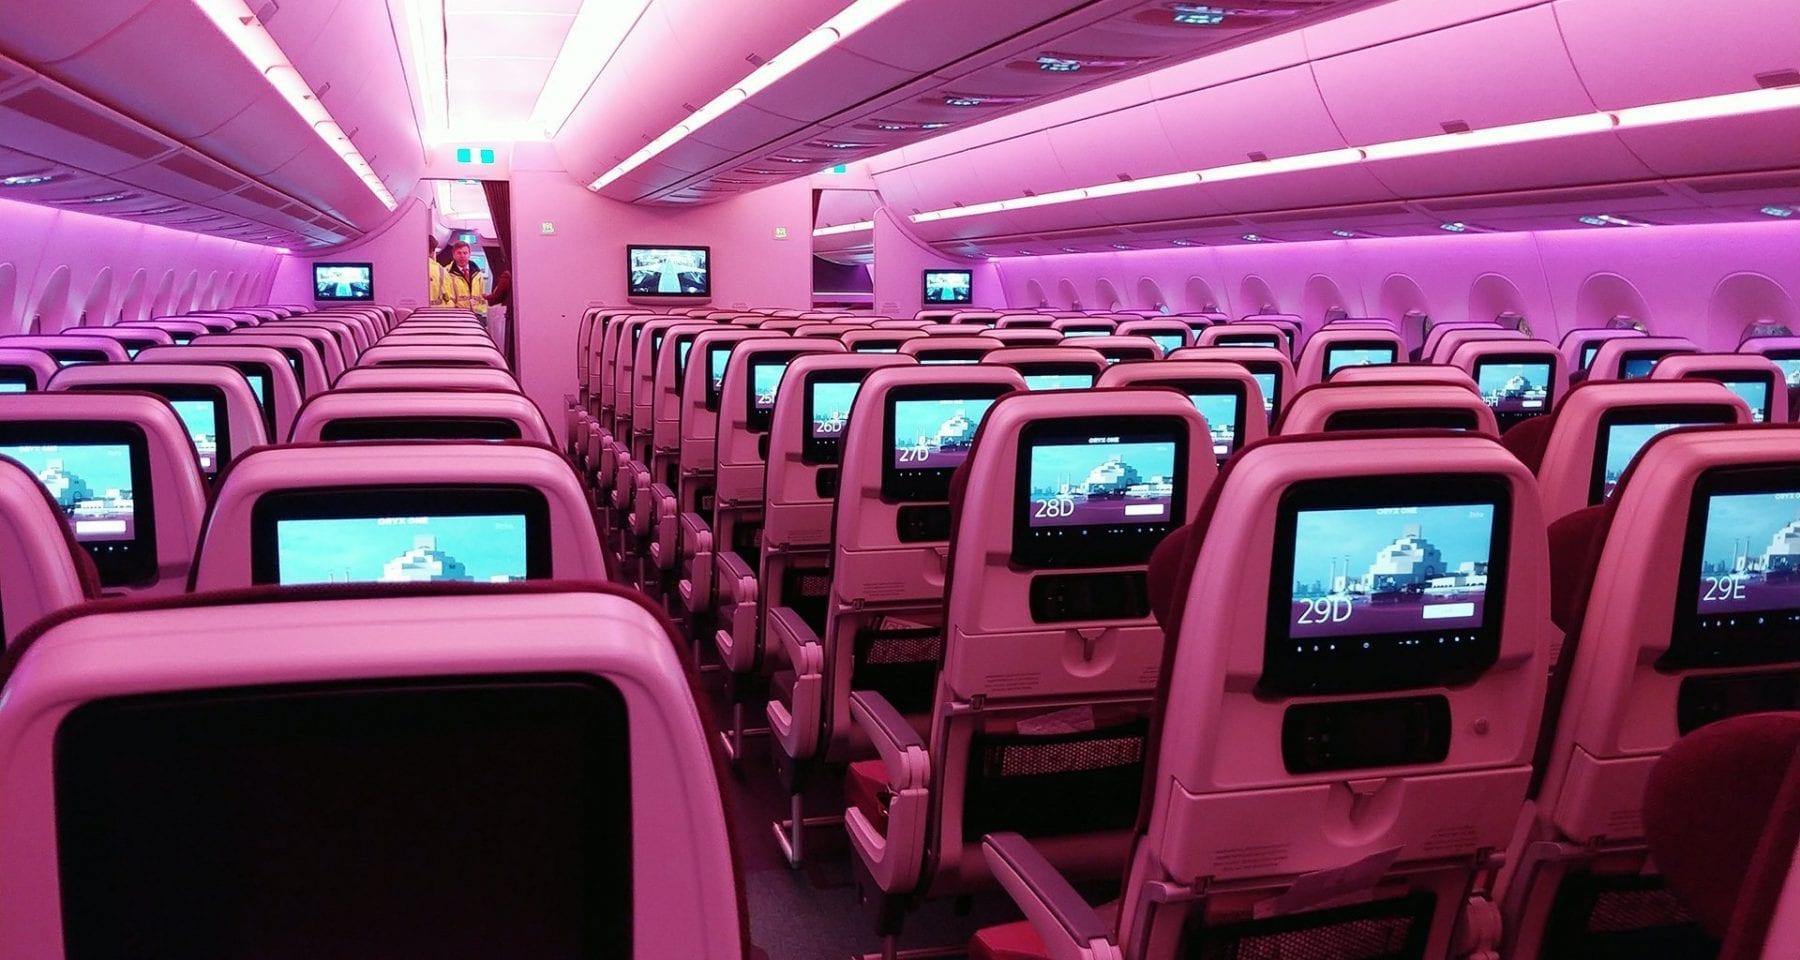 how good is Qatar airways economy class